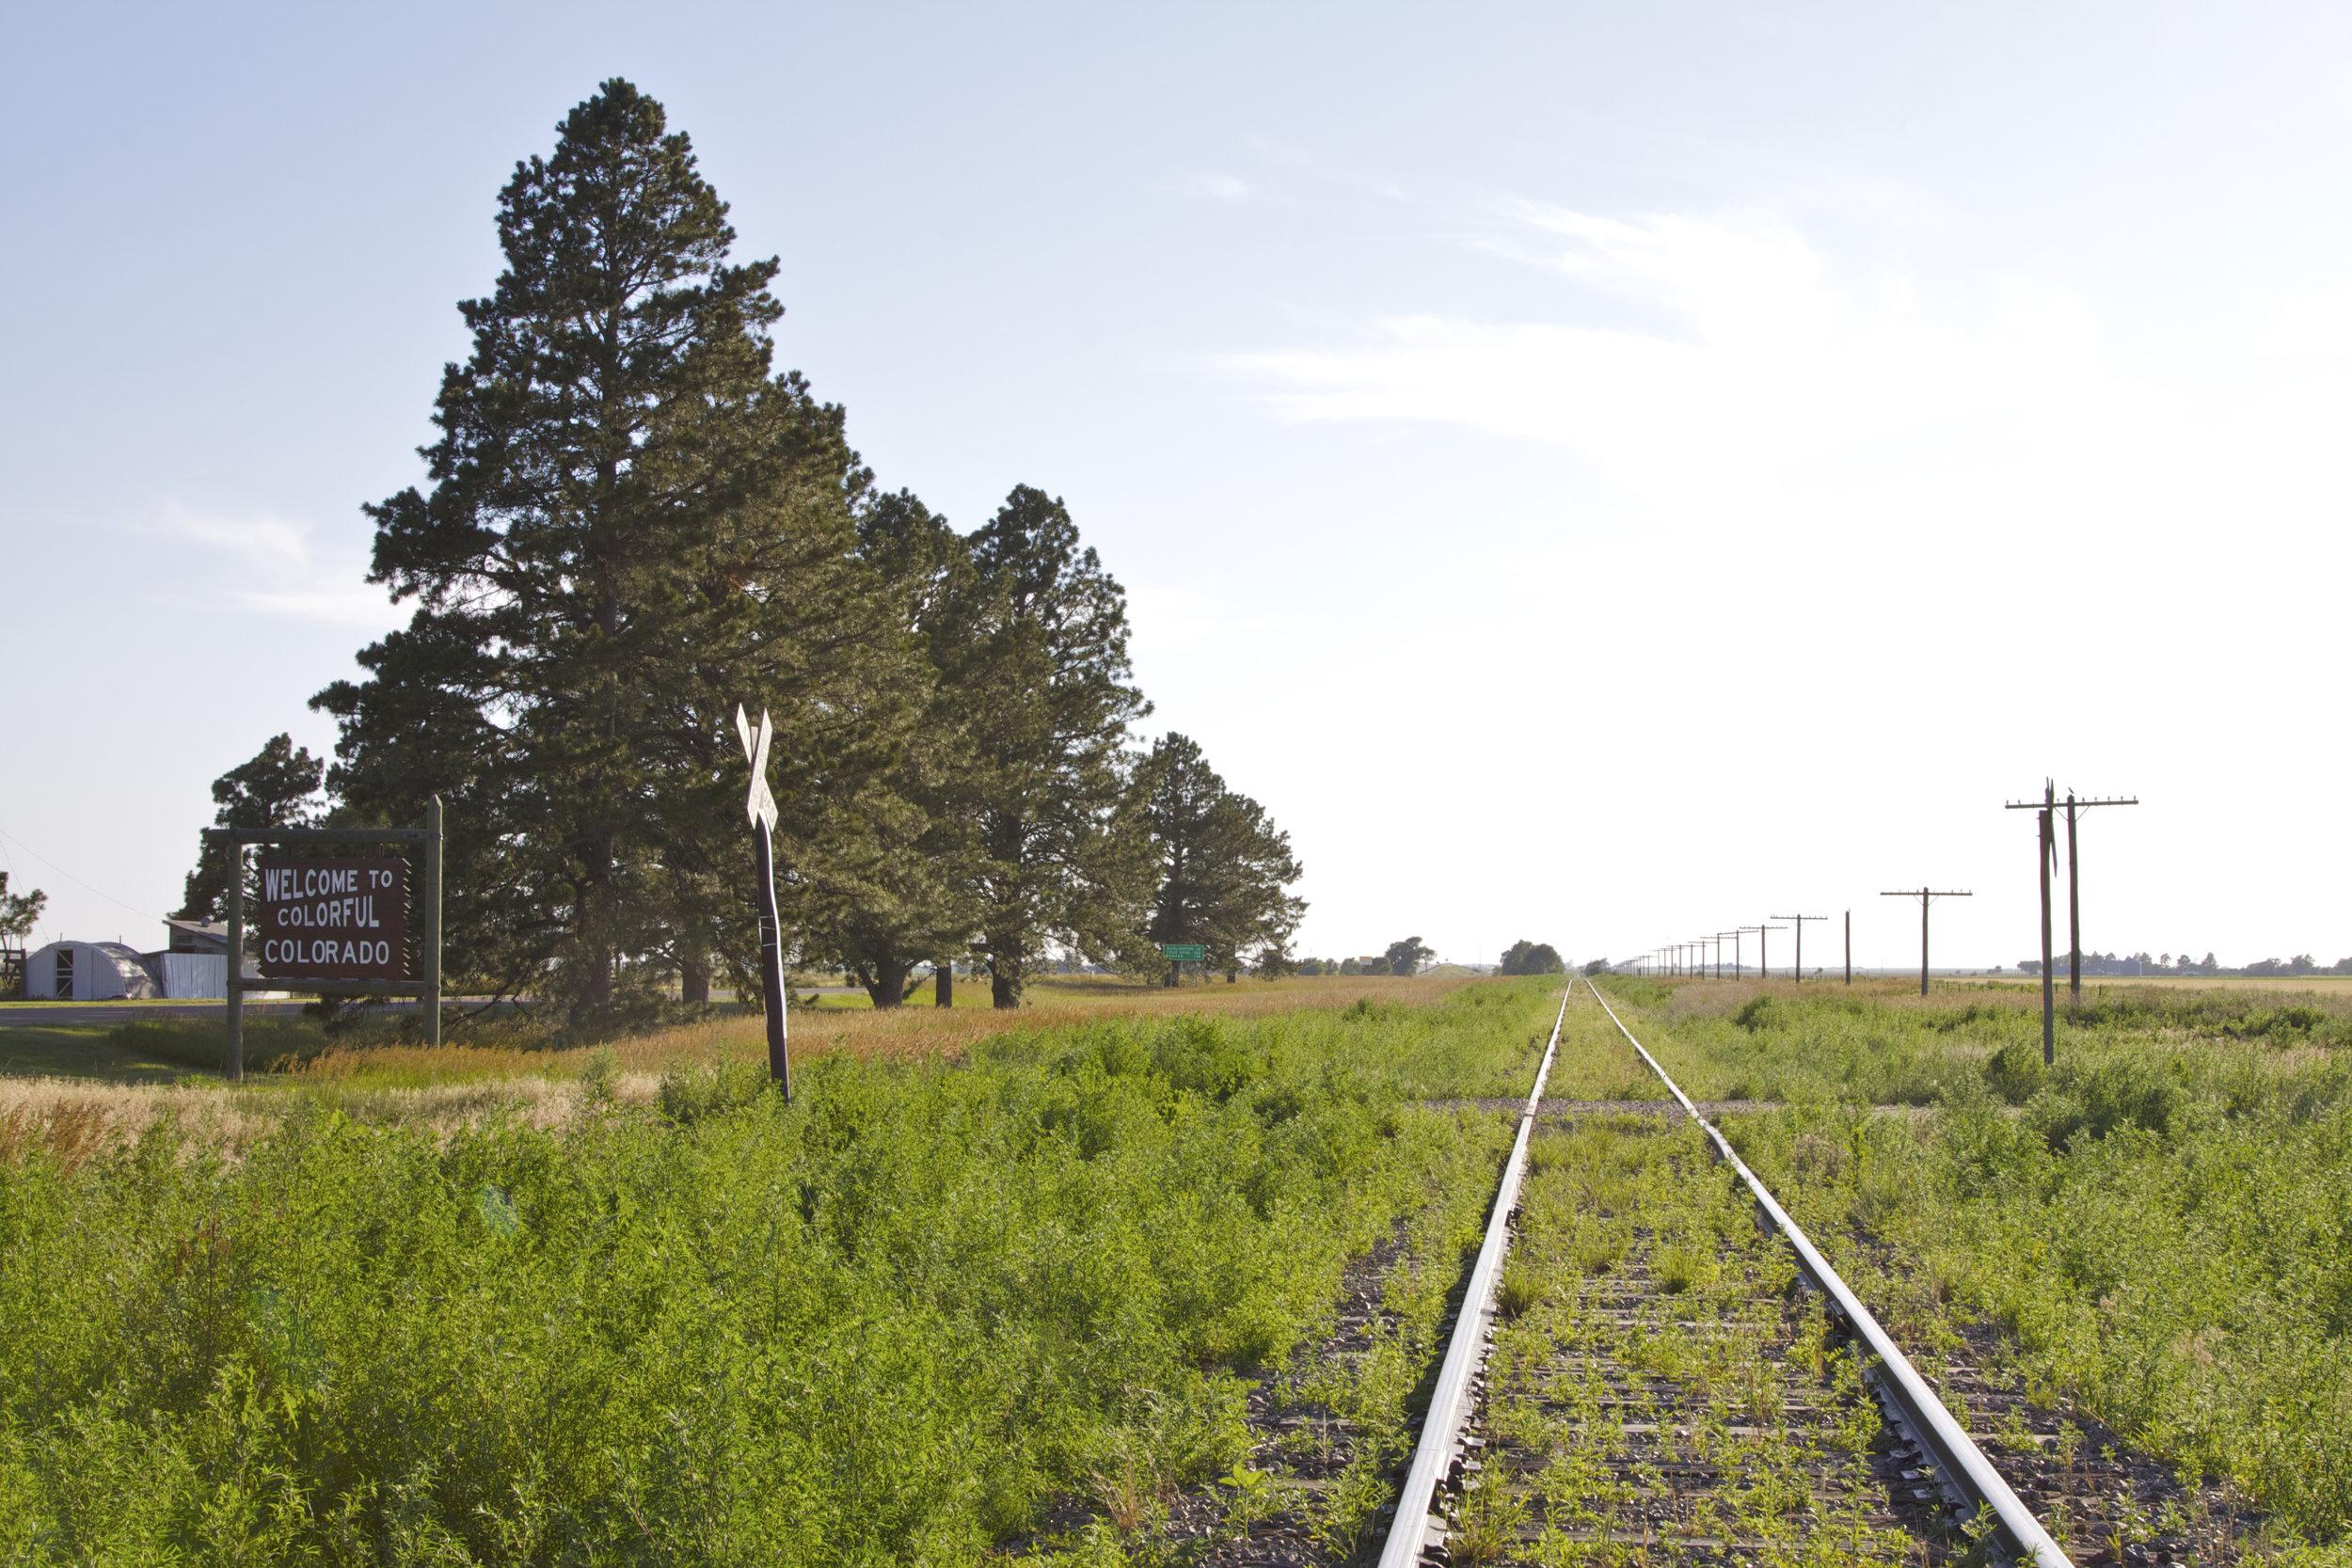 U.S. 24, Kit Carson County